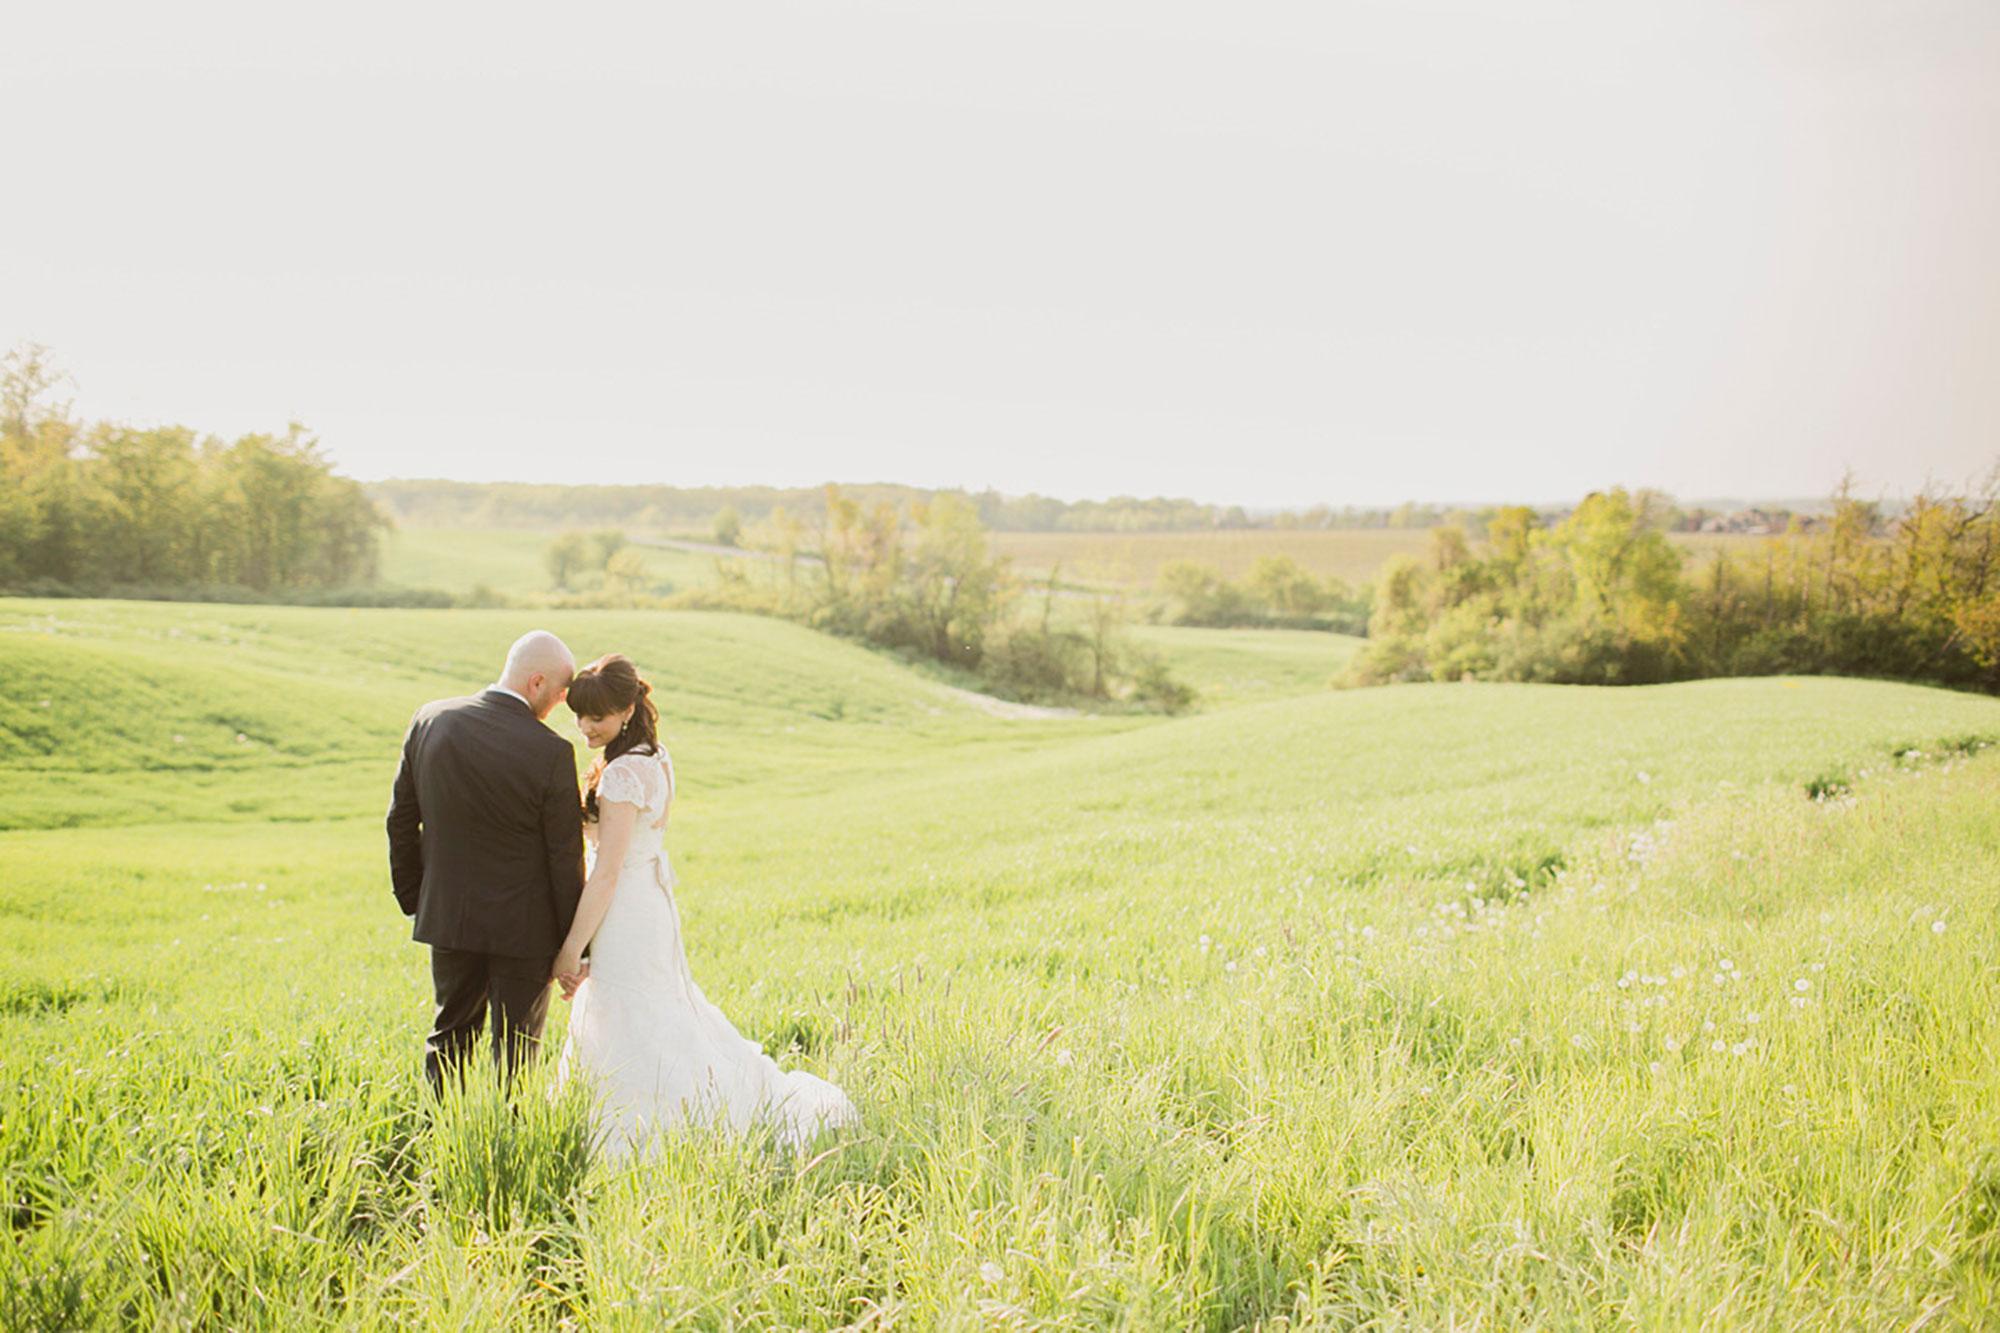 Balls-Falls-Vineyard-Bride-Photo-By-Elizabeth-in-Love-029.jpg